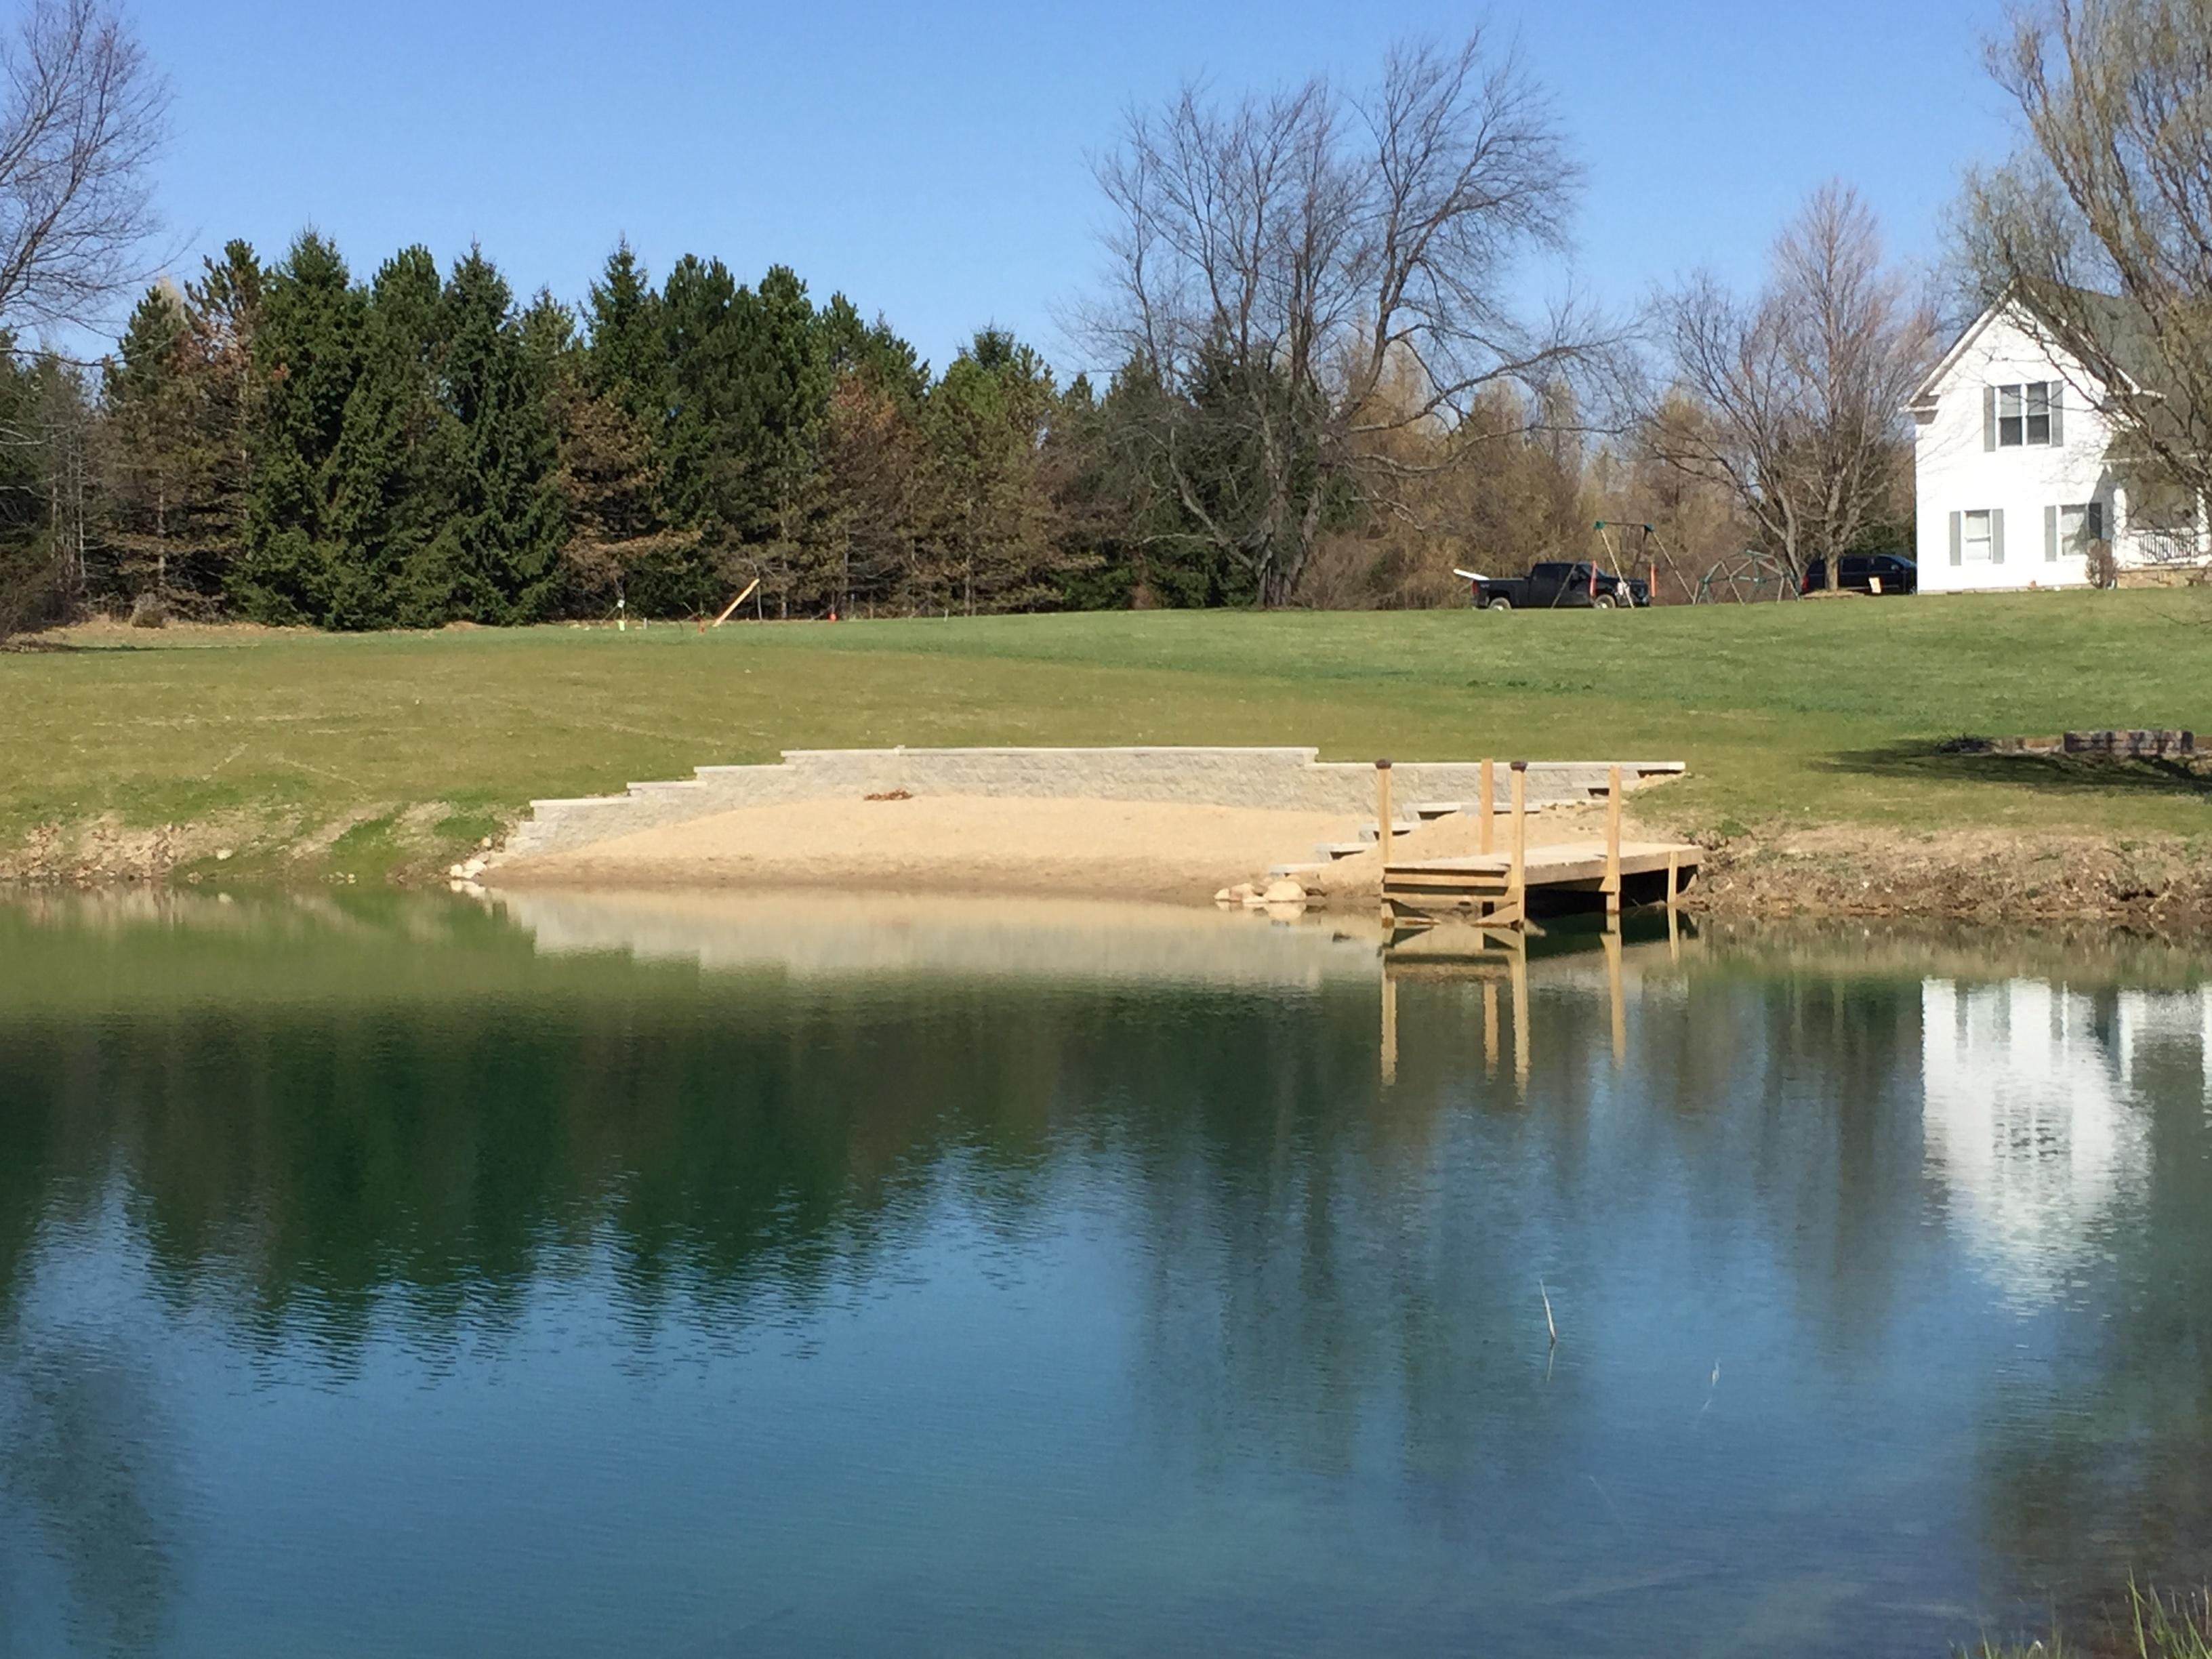 Pond_Problems_Howell_Michigan_windmill_beach_11.jpg